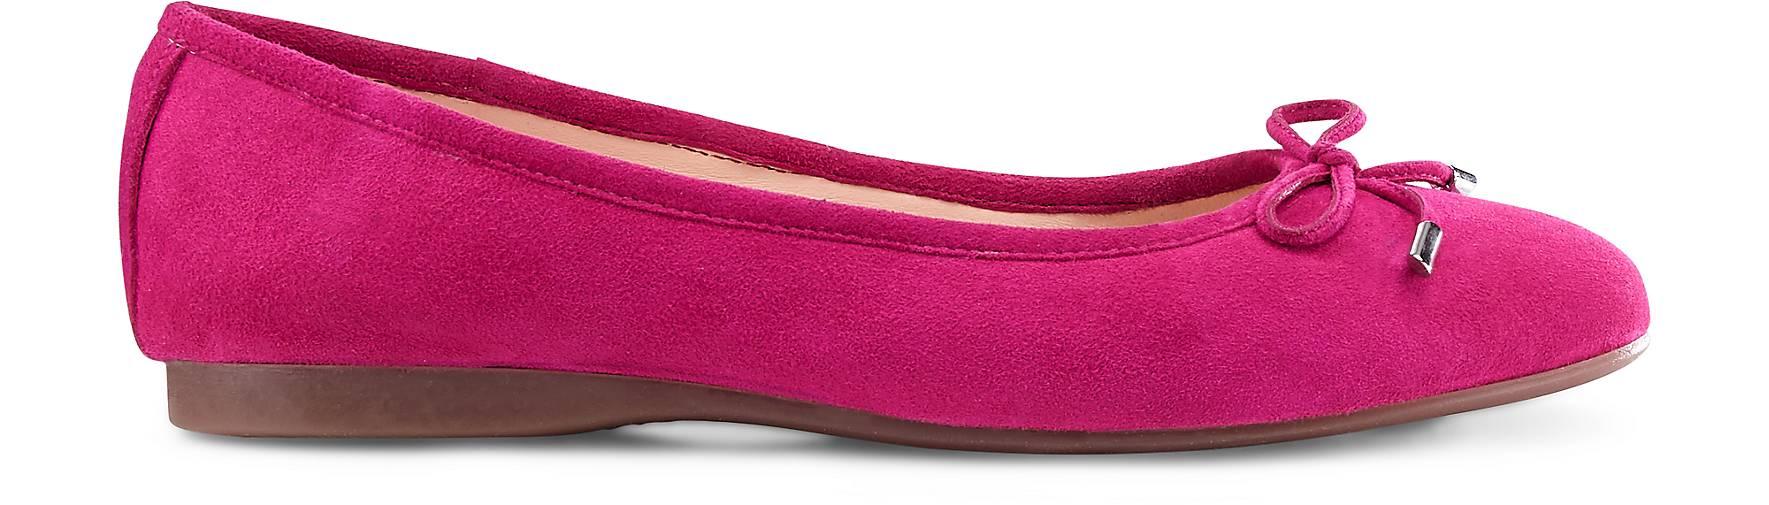 Cox Nubuk-Ballerina Qualität in Rosa kaufen - 45446908 GÖRTZ Gute Qualität Nubuk-Ballerina beliebte Schuhe c16a5e